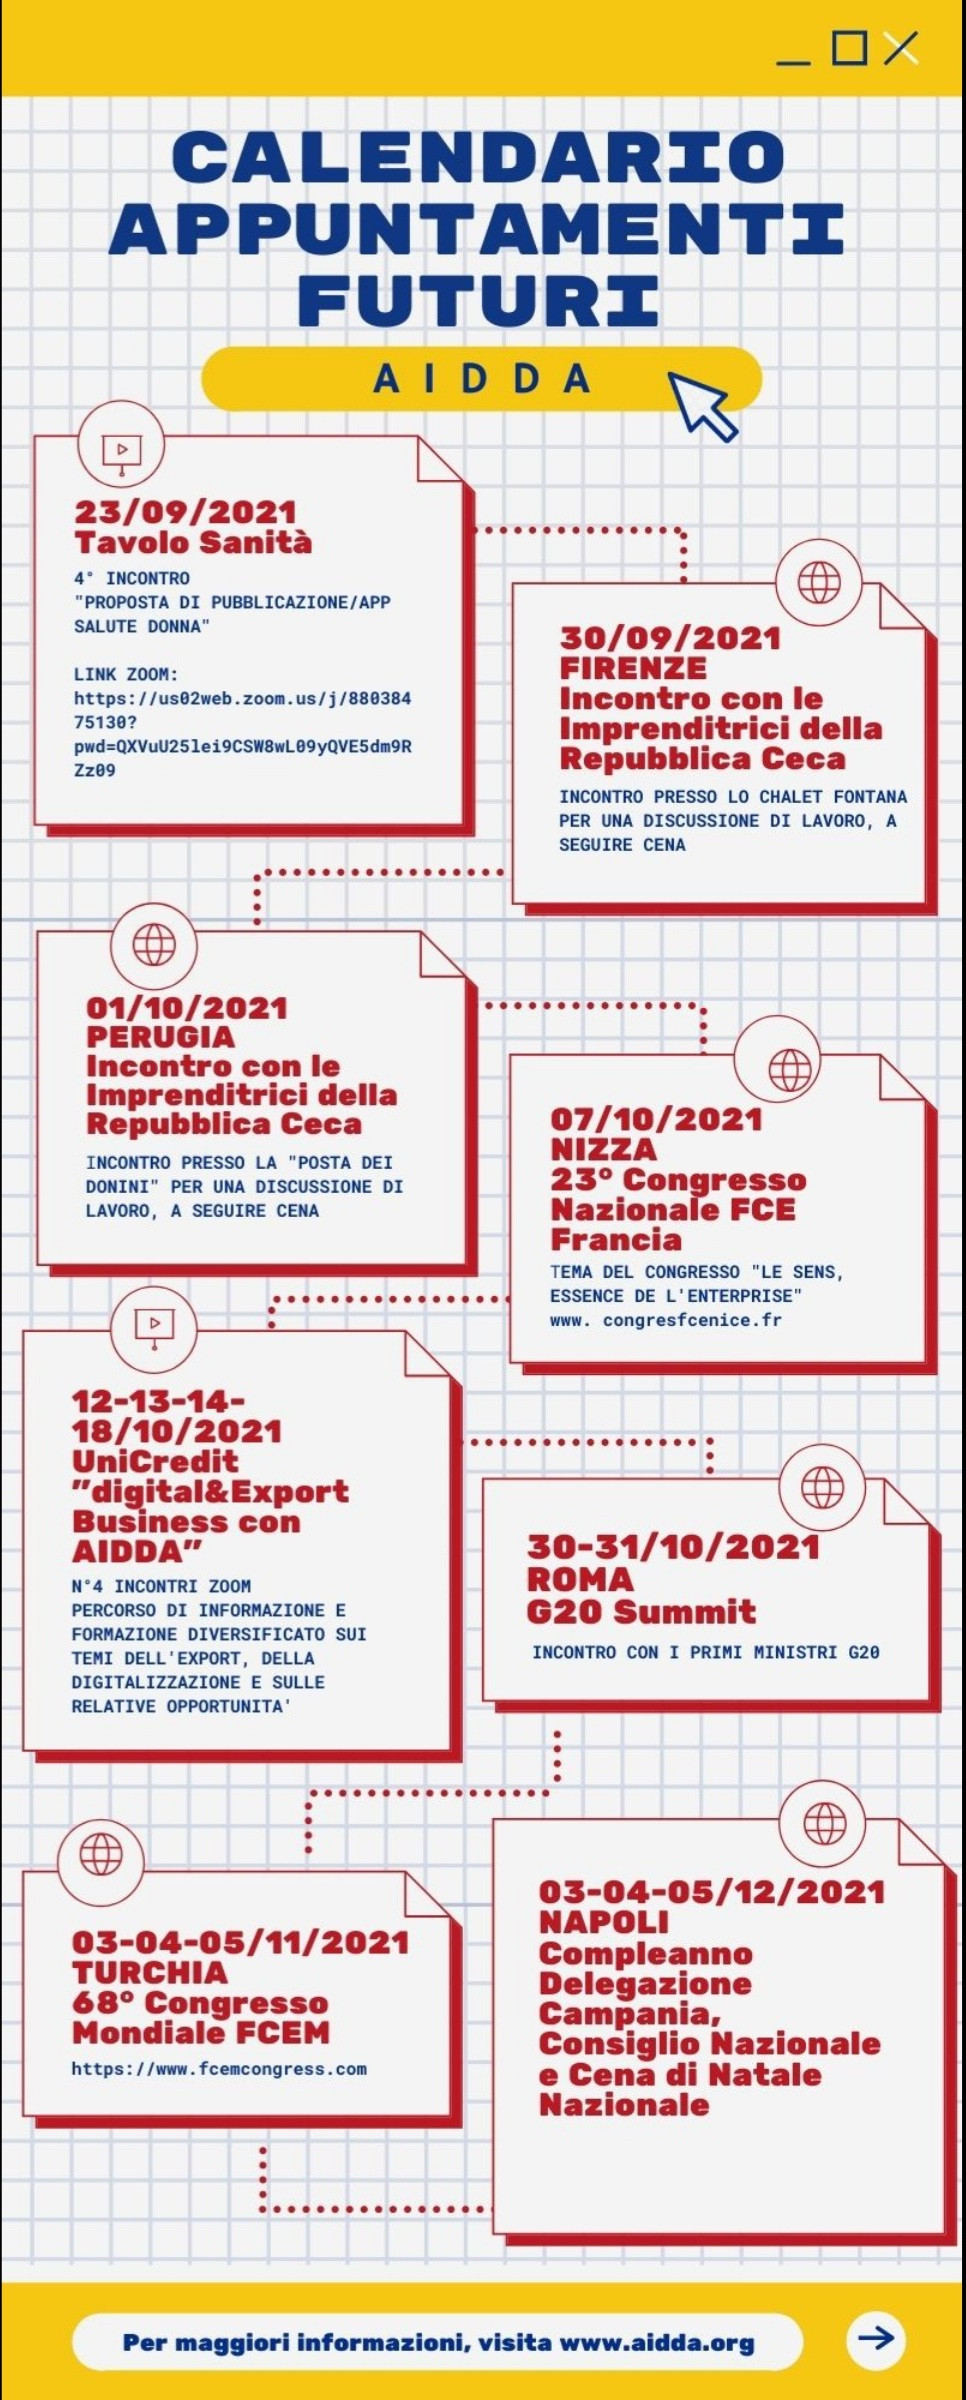 AIDDA Calendario Appuntamenti Futuri 2021